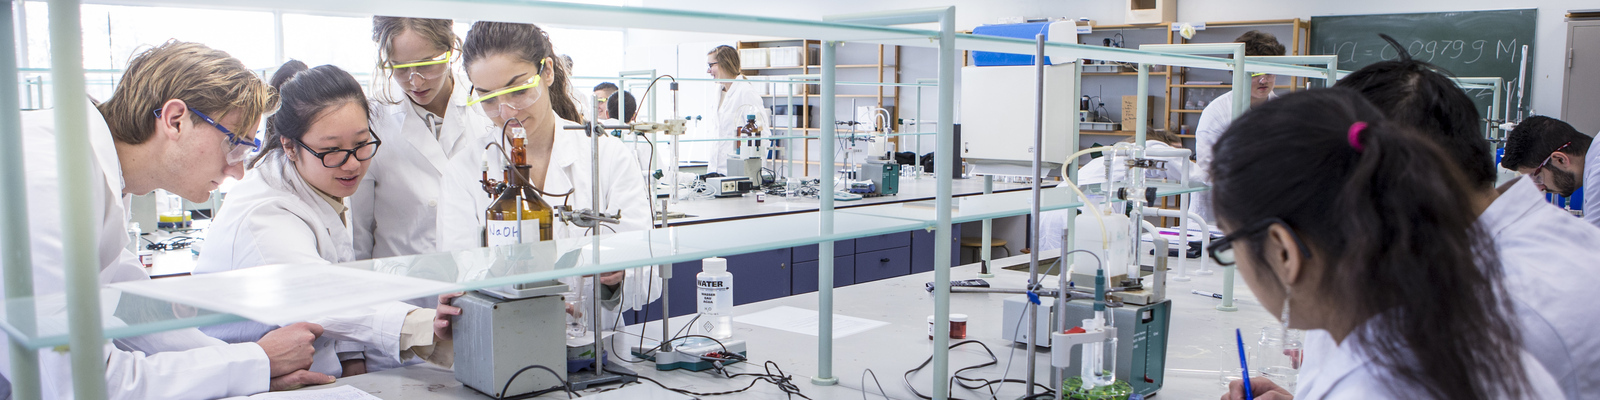 3D printen van levende weefsels (28 nov)